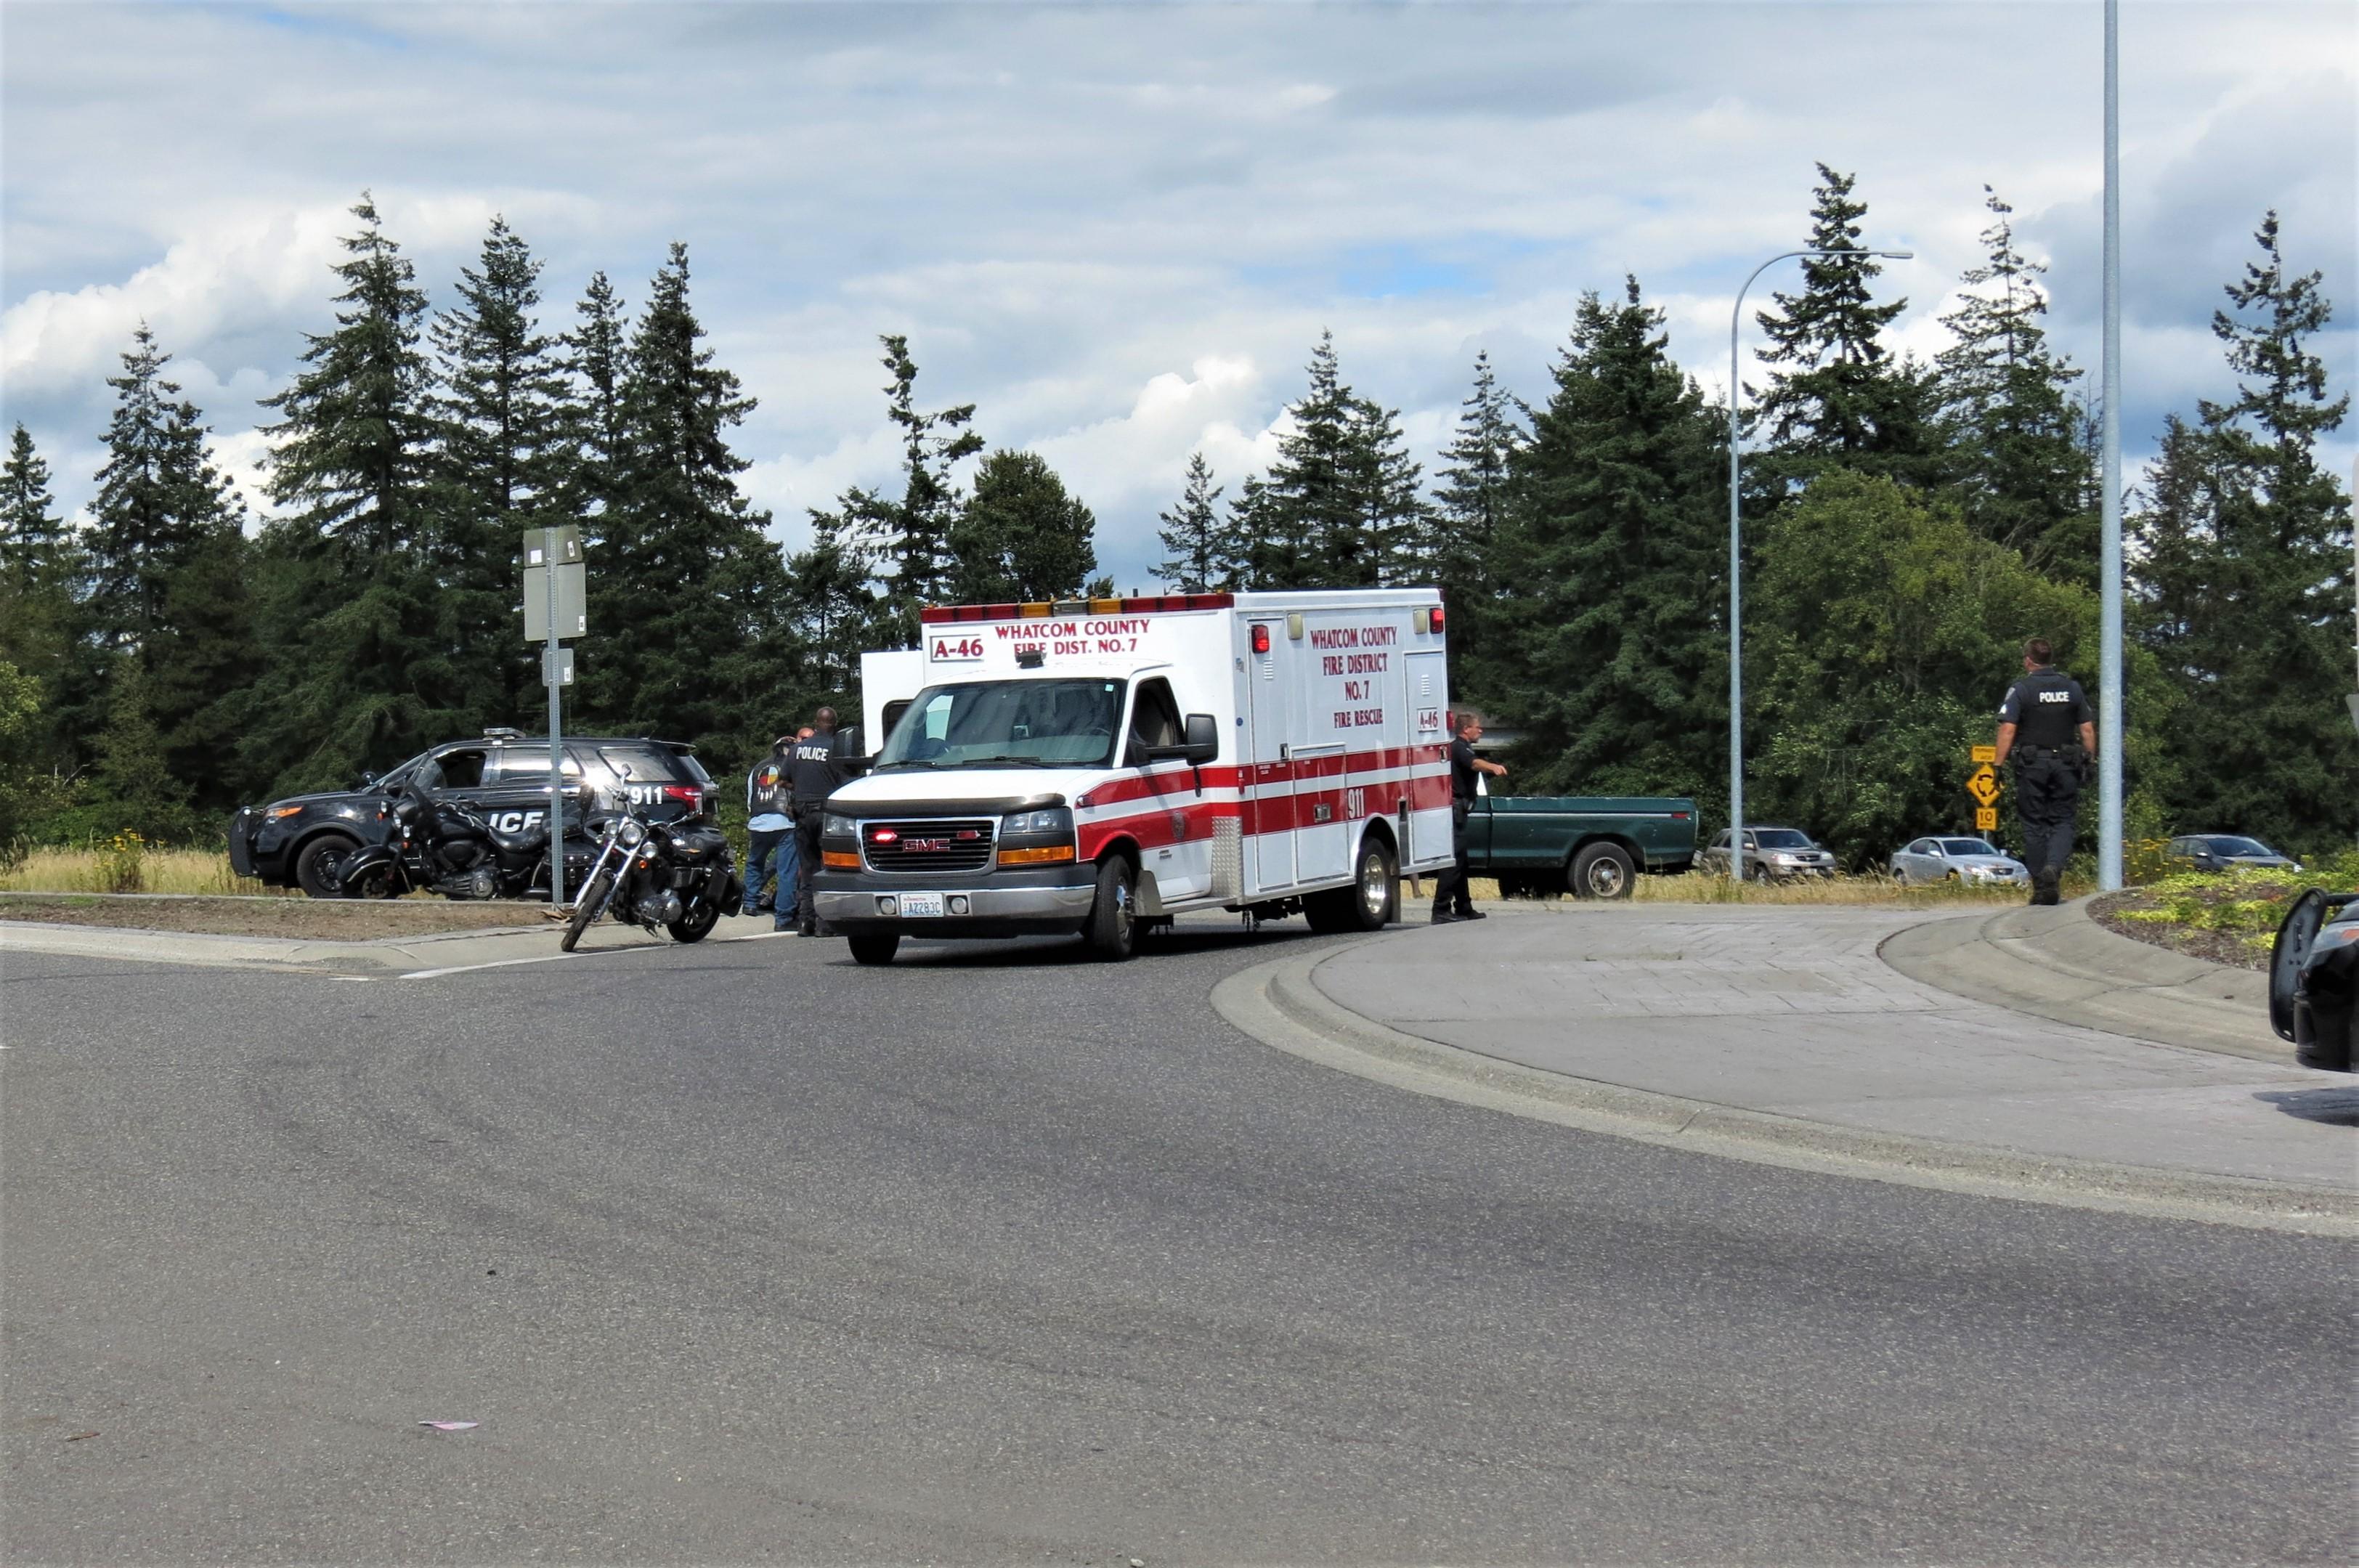 Scene of motorcycle crash at Portal Way roundabout (July 27, 2019). Photo: My Ferndale News